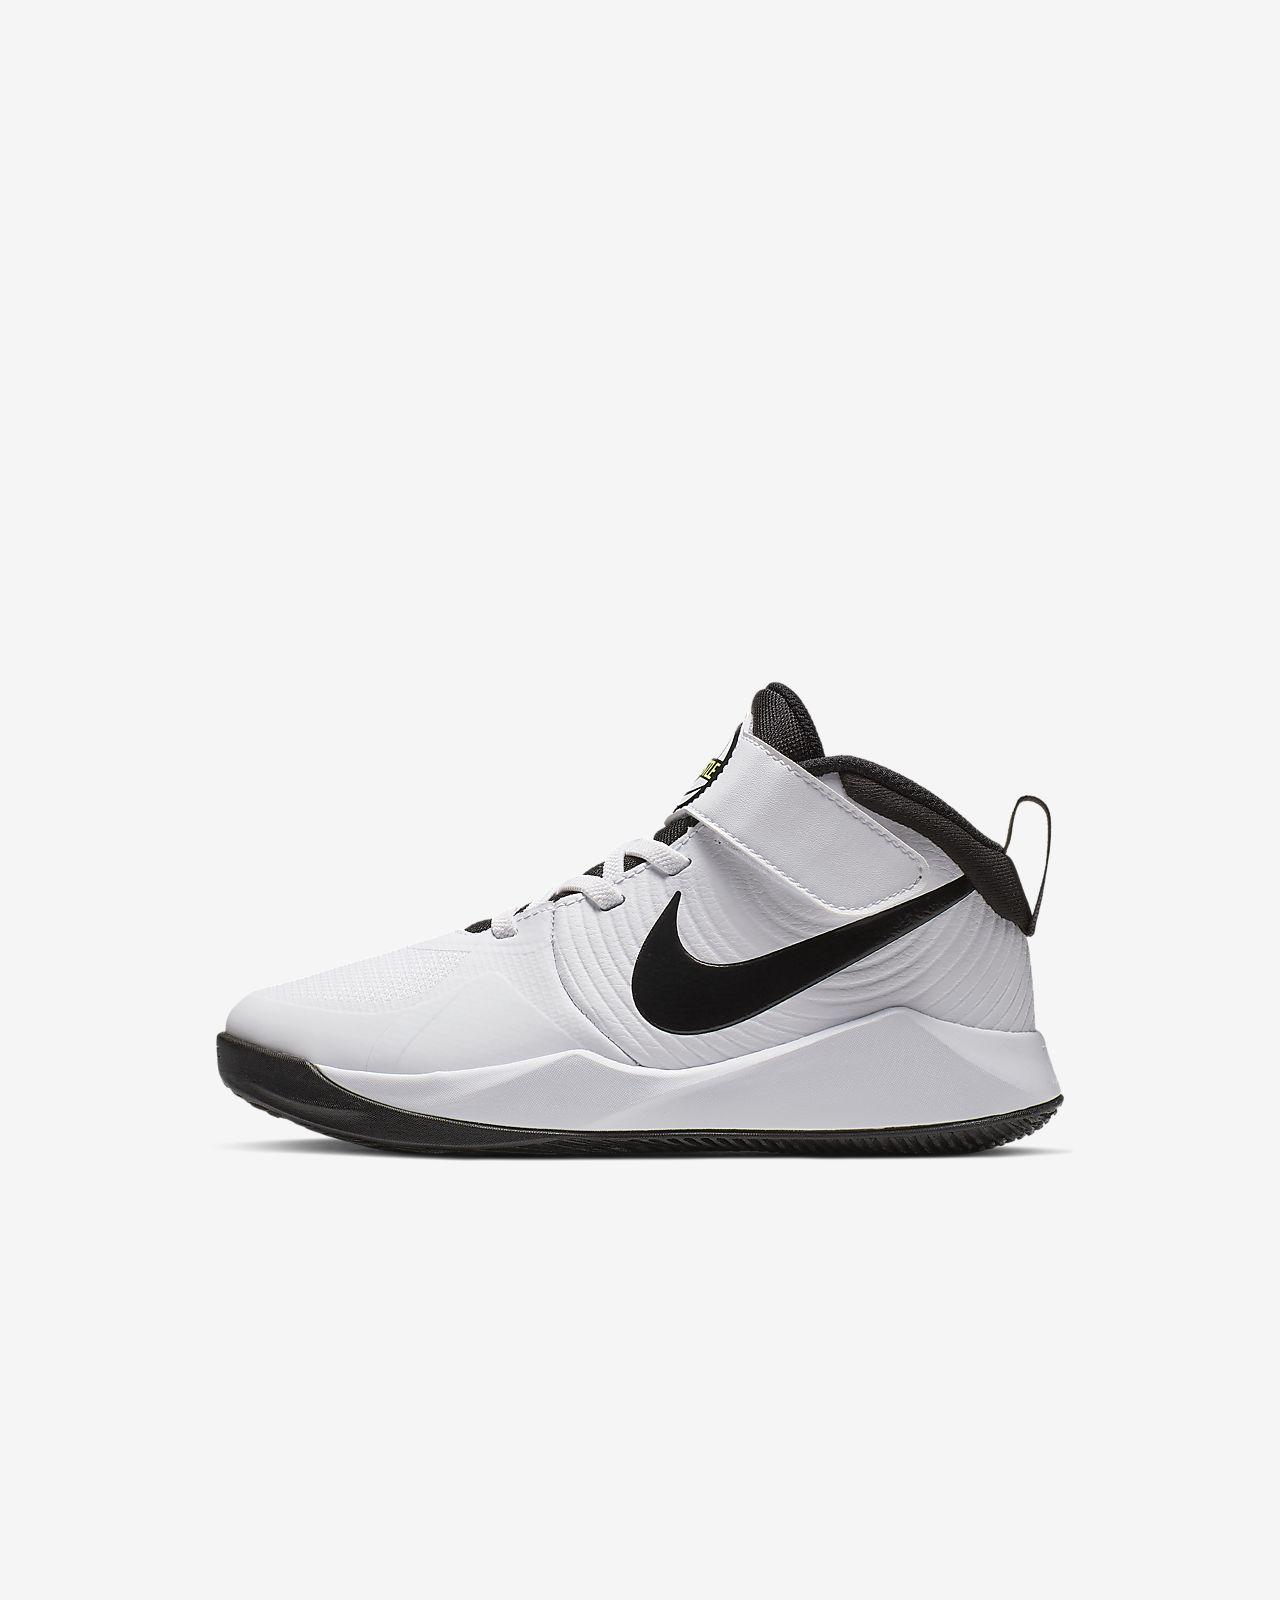 Cipő Kisebb Nike Hustle D 9 Team GyerekeknekHu 7gbyIvf6Ym